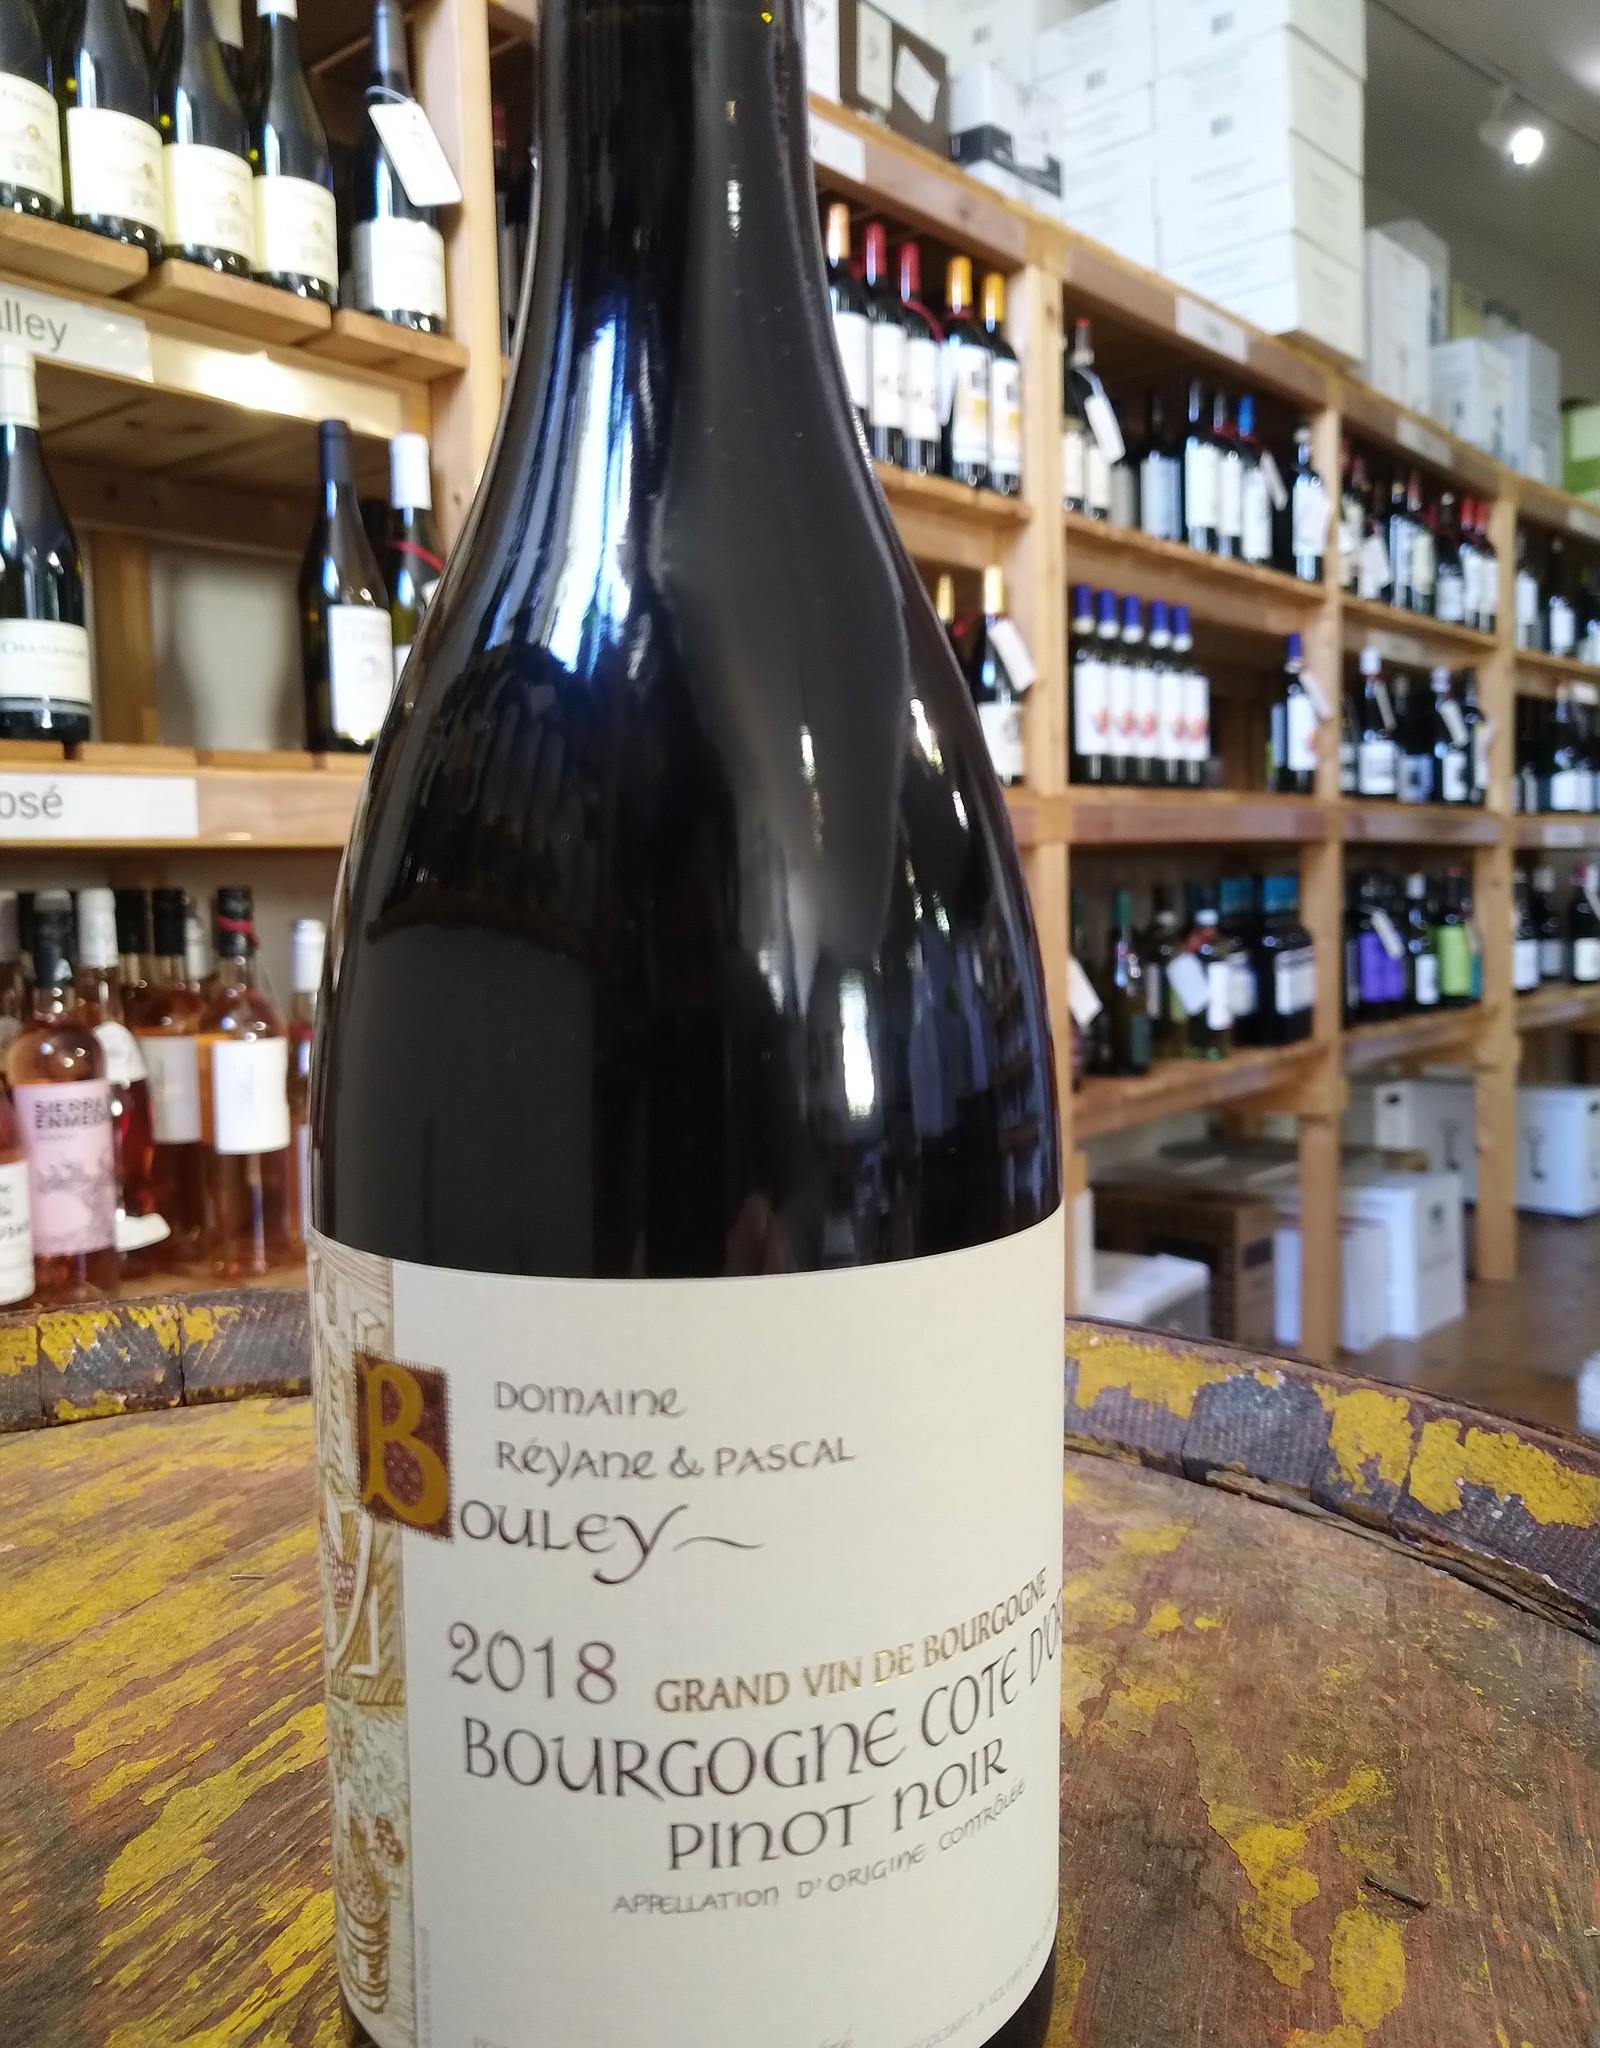 Bouley Bourgogne Côte d'Or Pinot Noir 2018